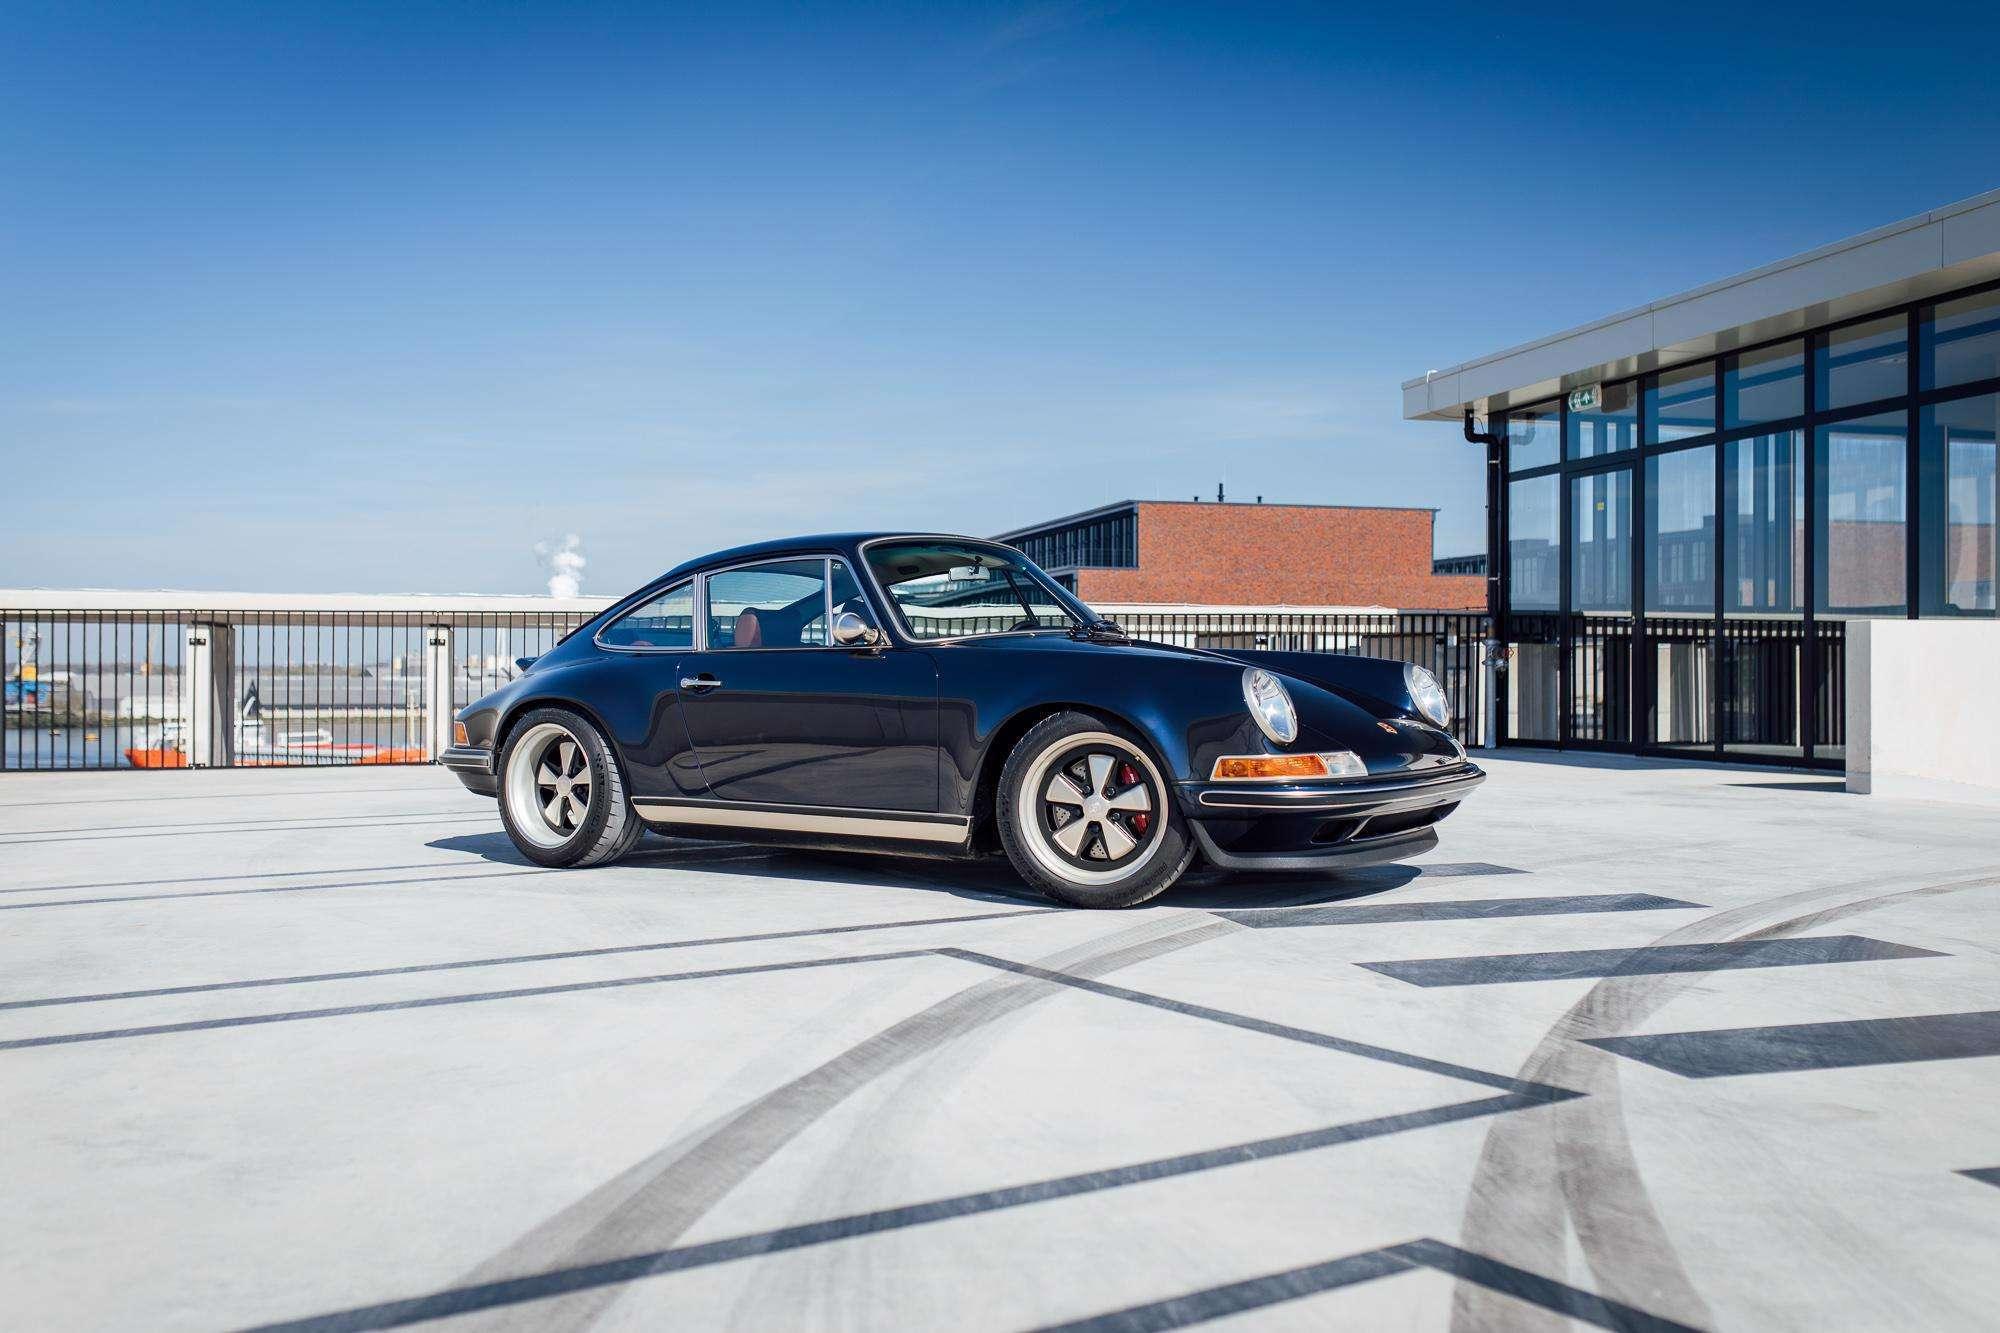 Porsche Singer for sale